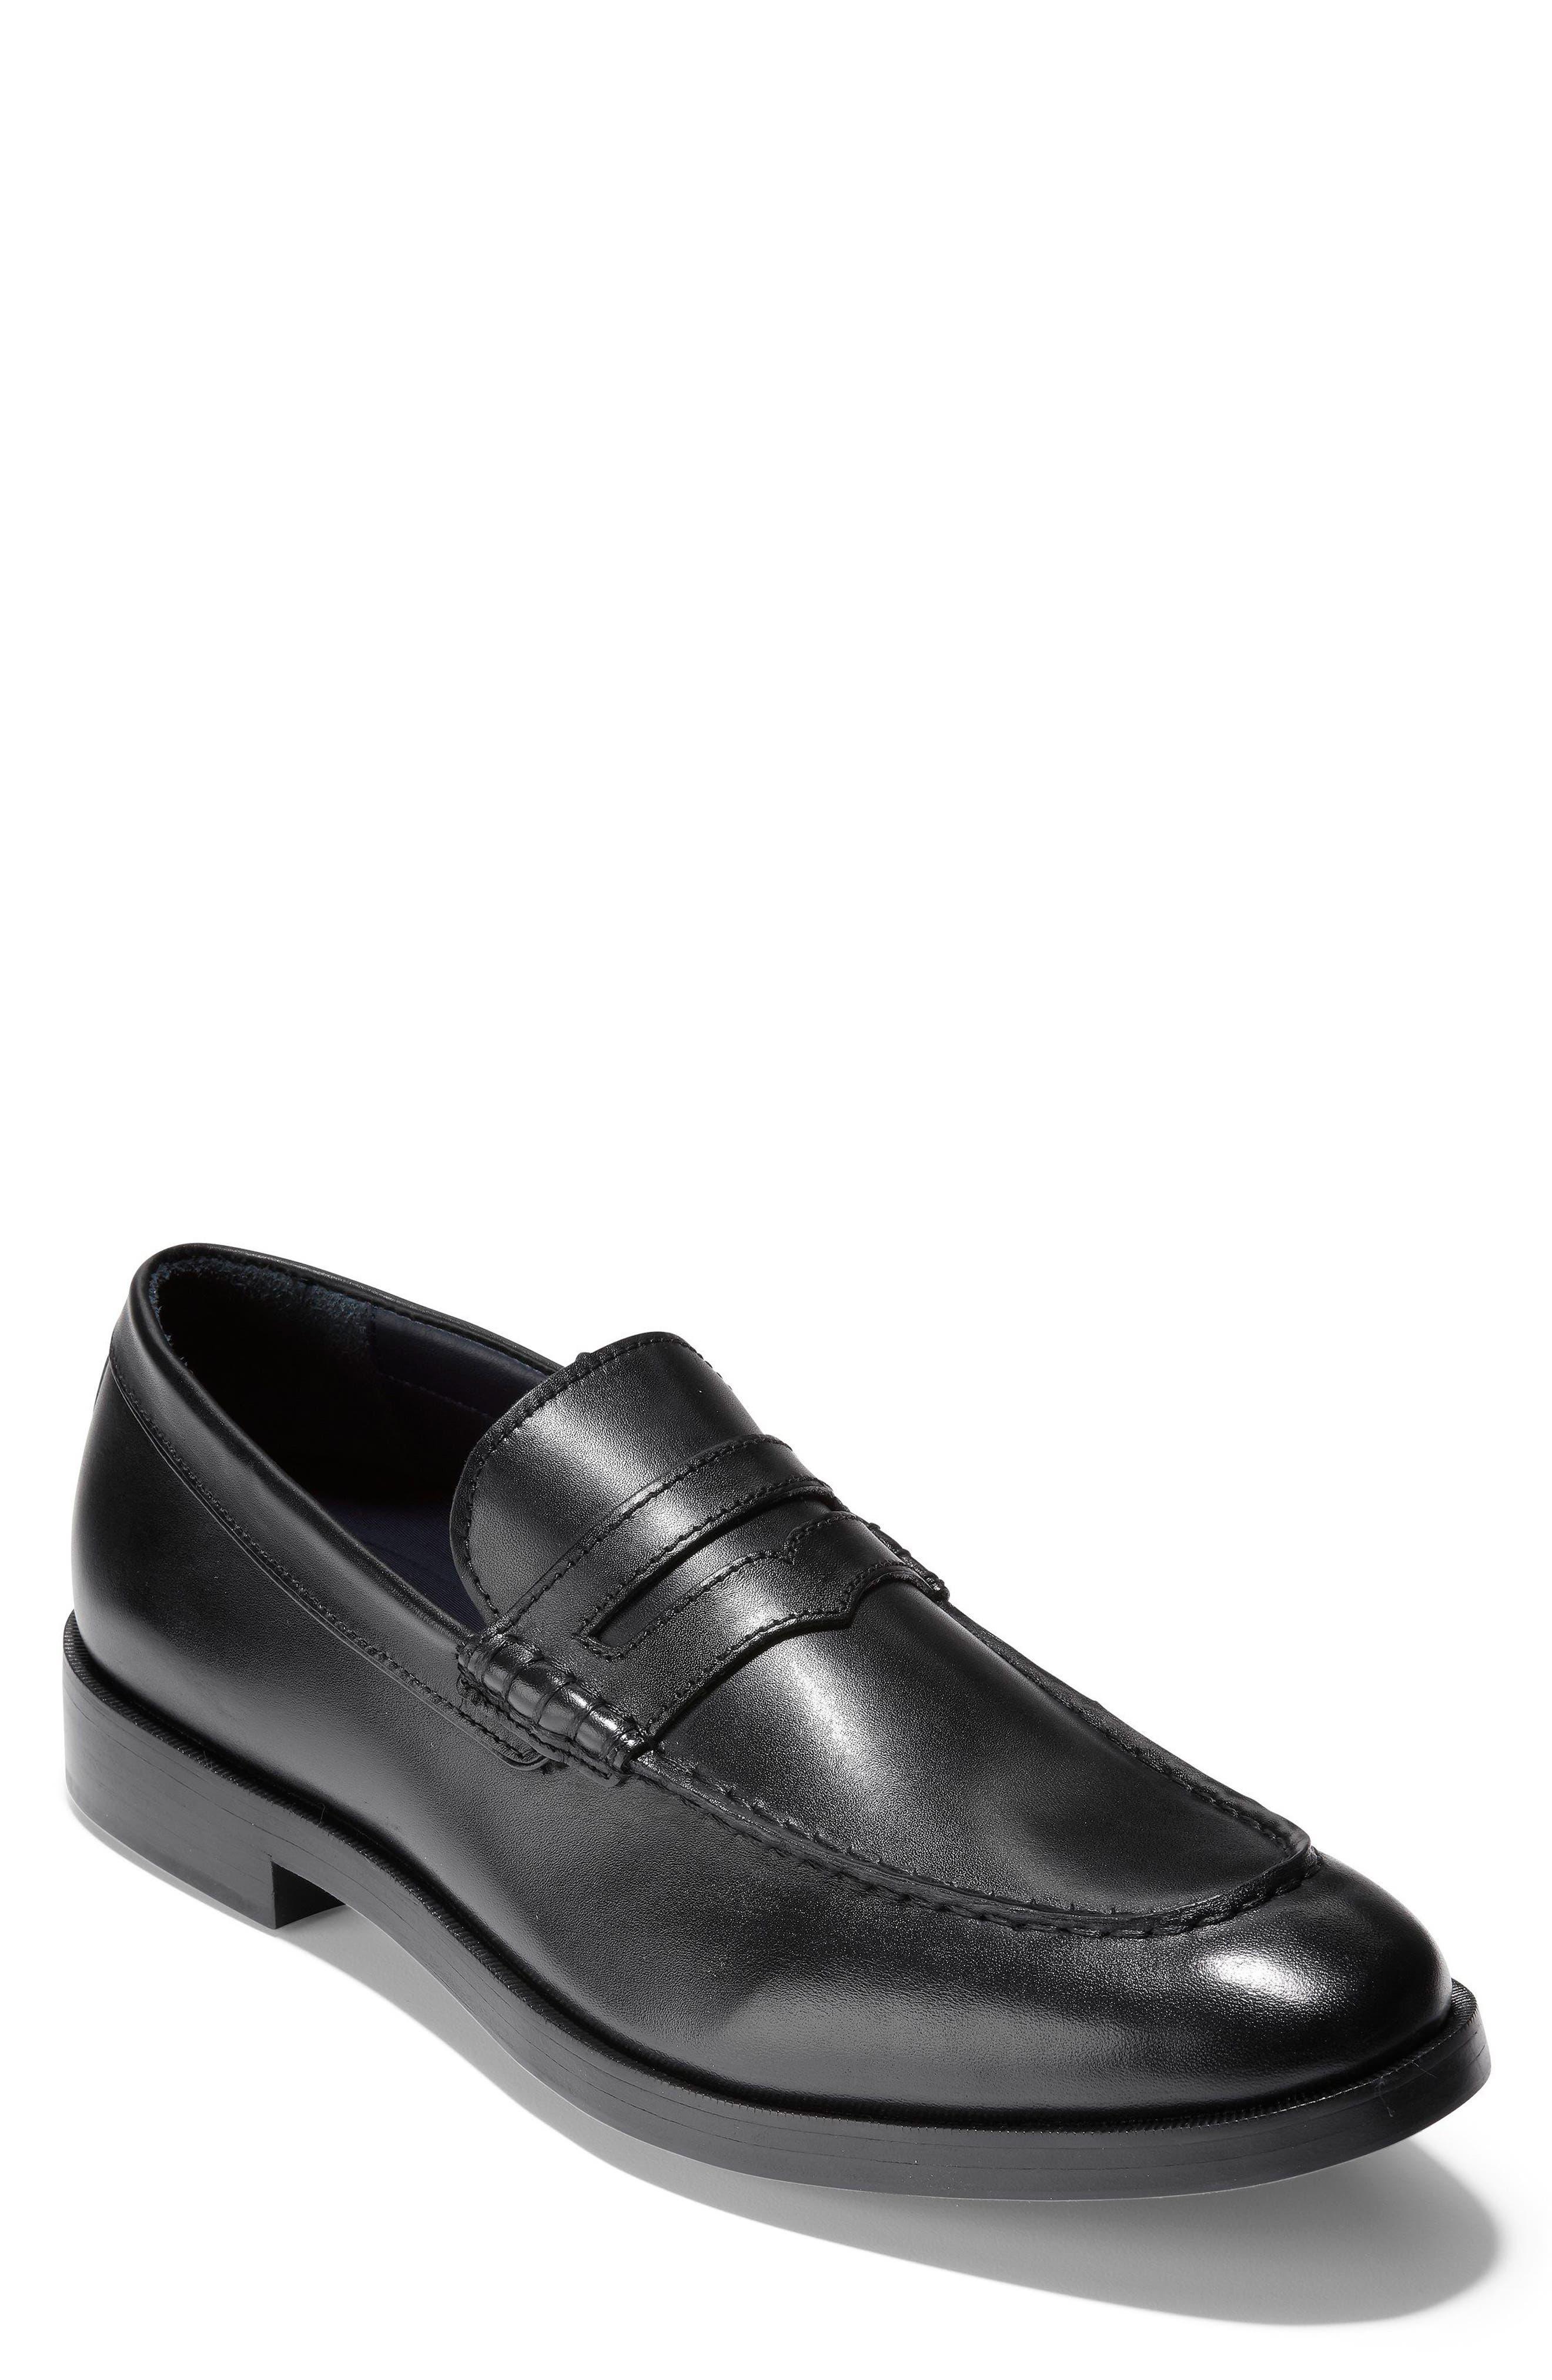 Hamilton Grand Penny Loafer,                             Main thumbnail 1, color,                             Black Leather